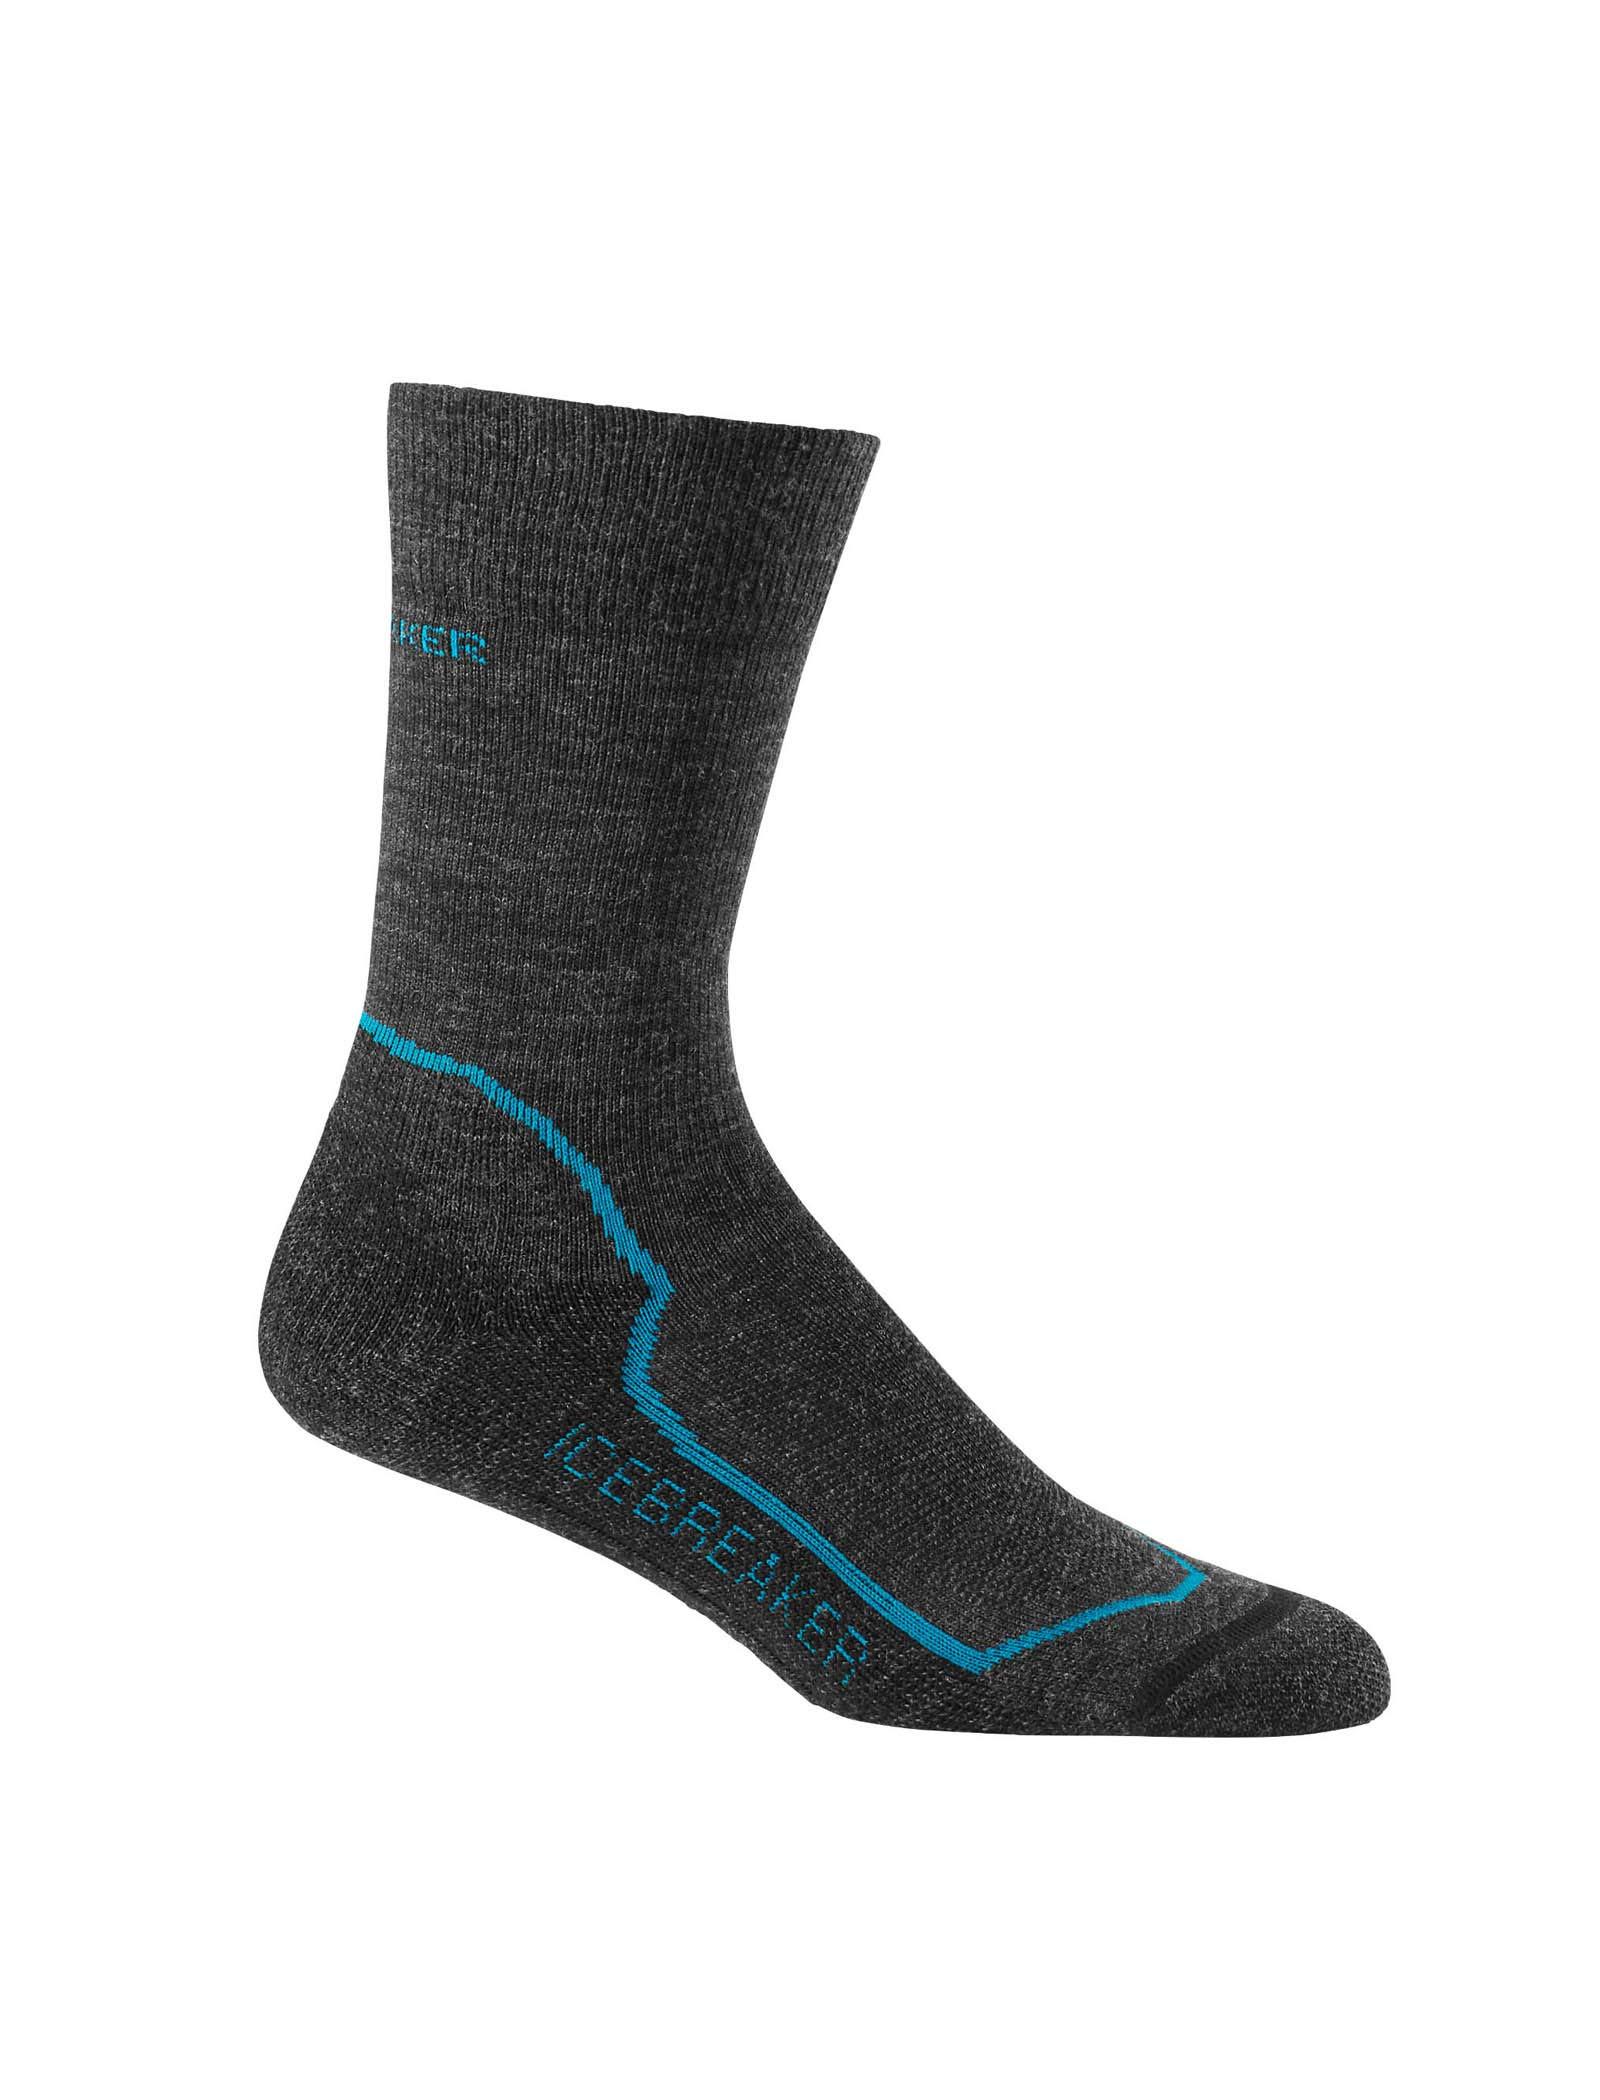 Icebreaker Merino Hike+ Medium Crew Hiking-Socks